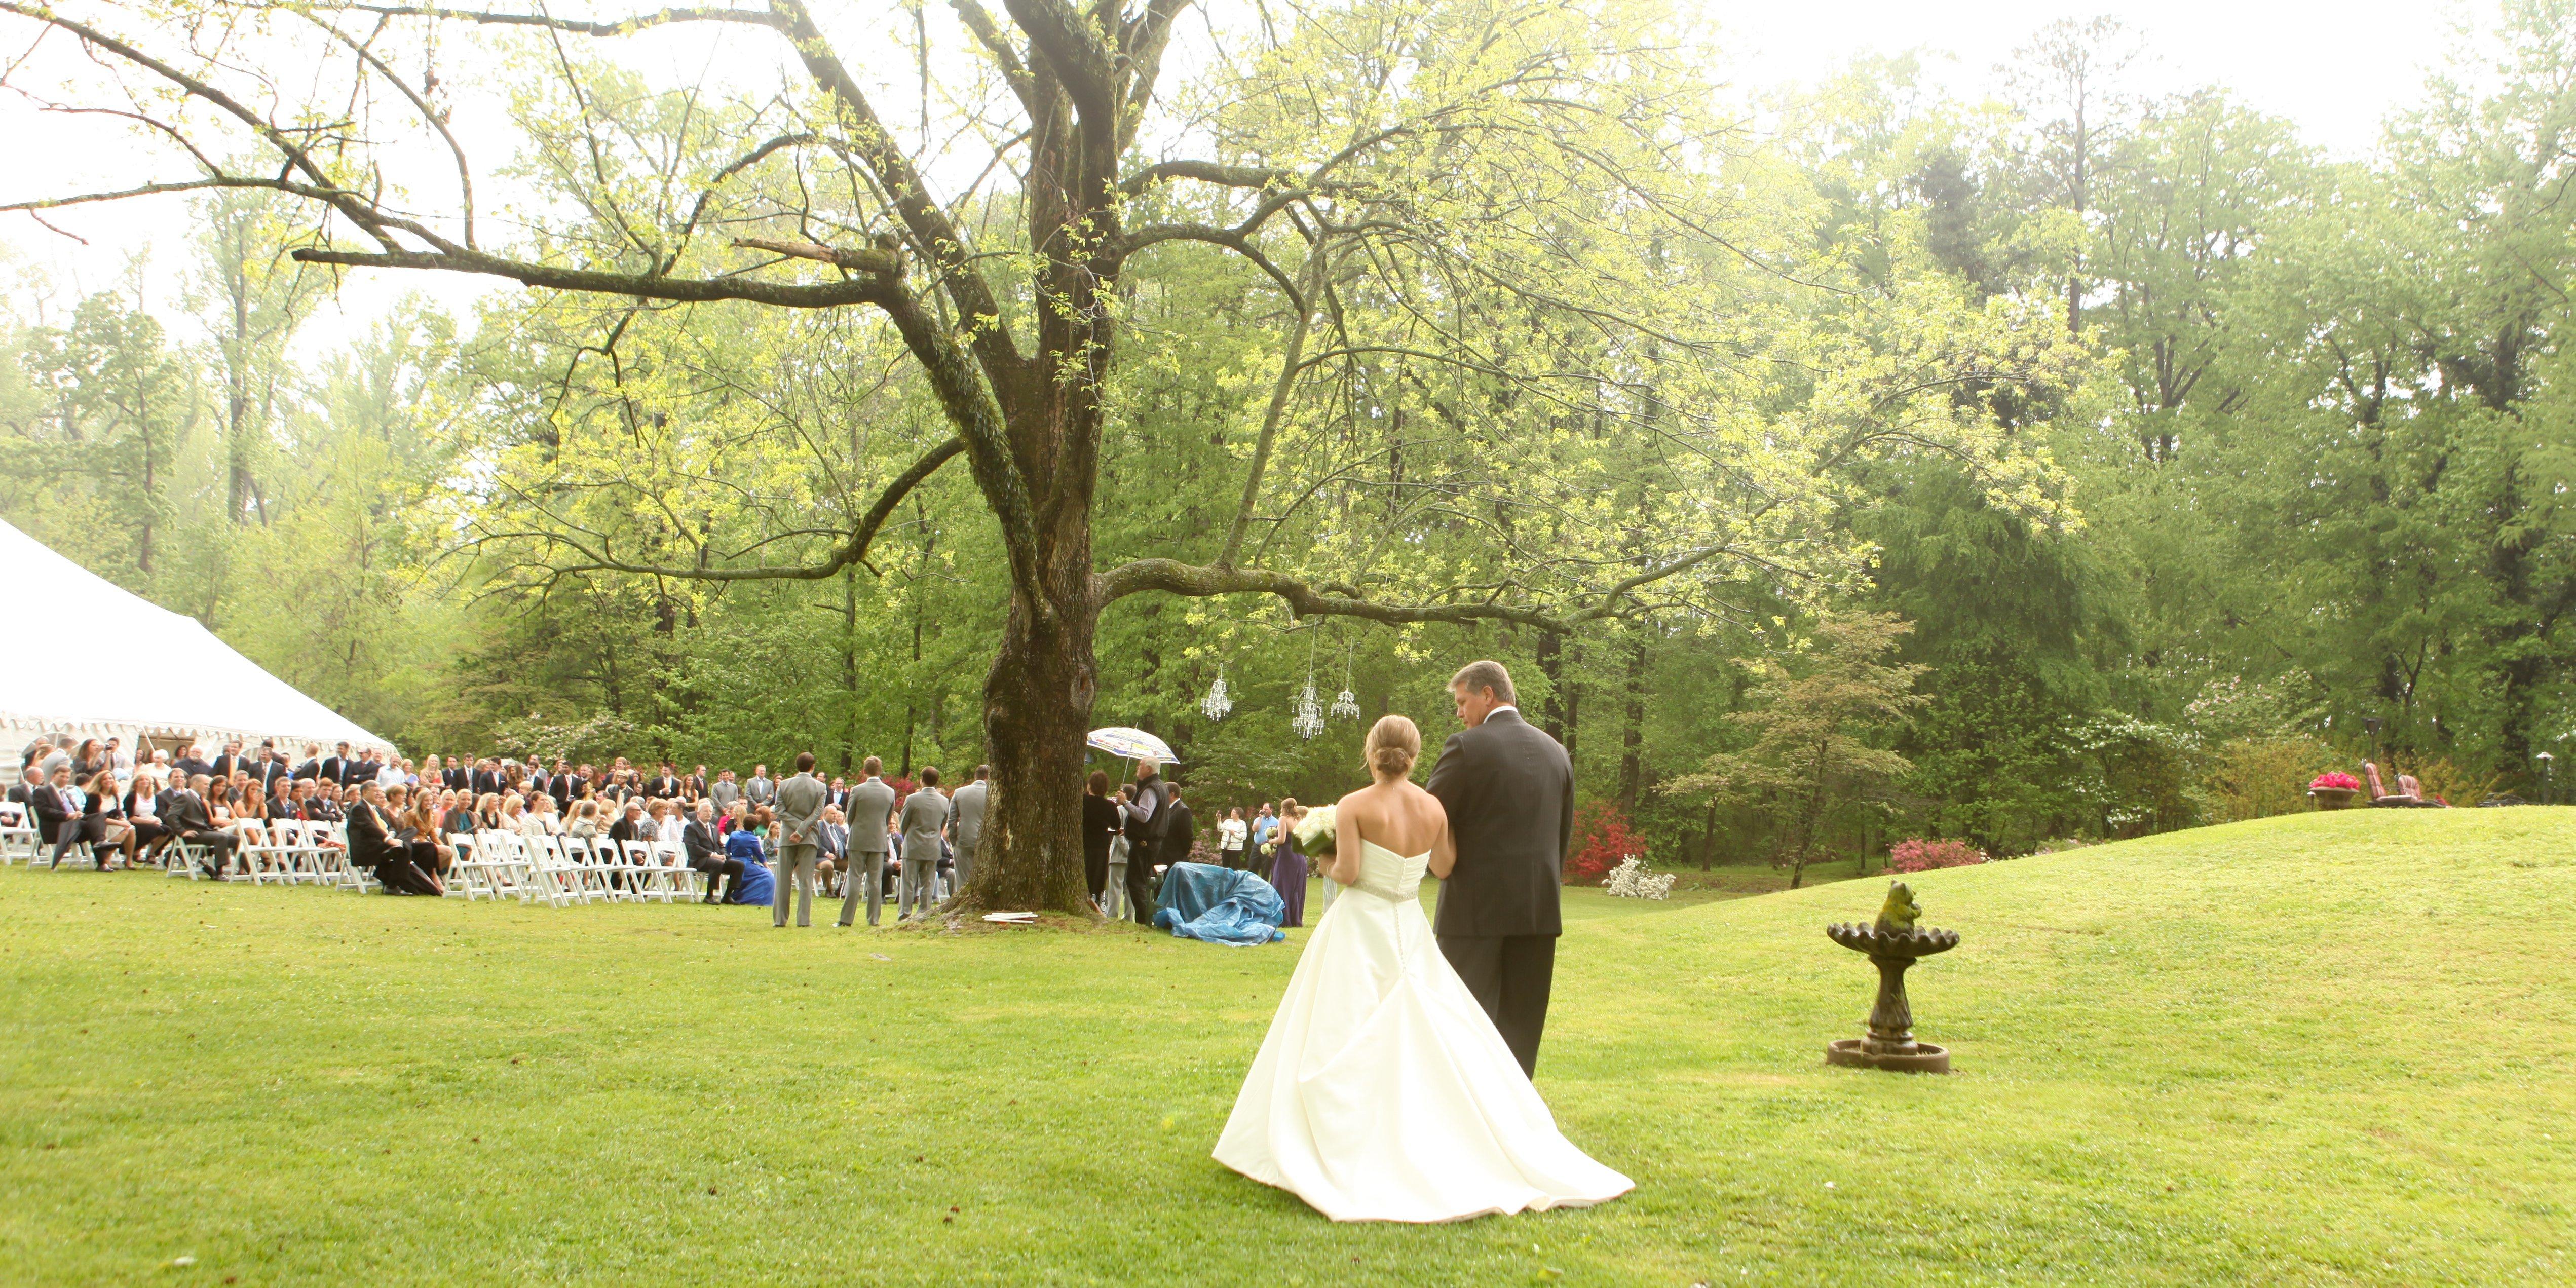 bridal picture venue in little rock ar